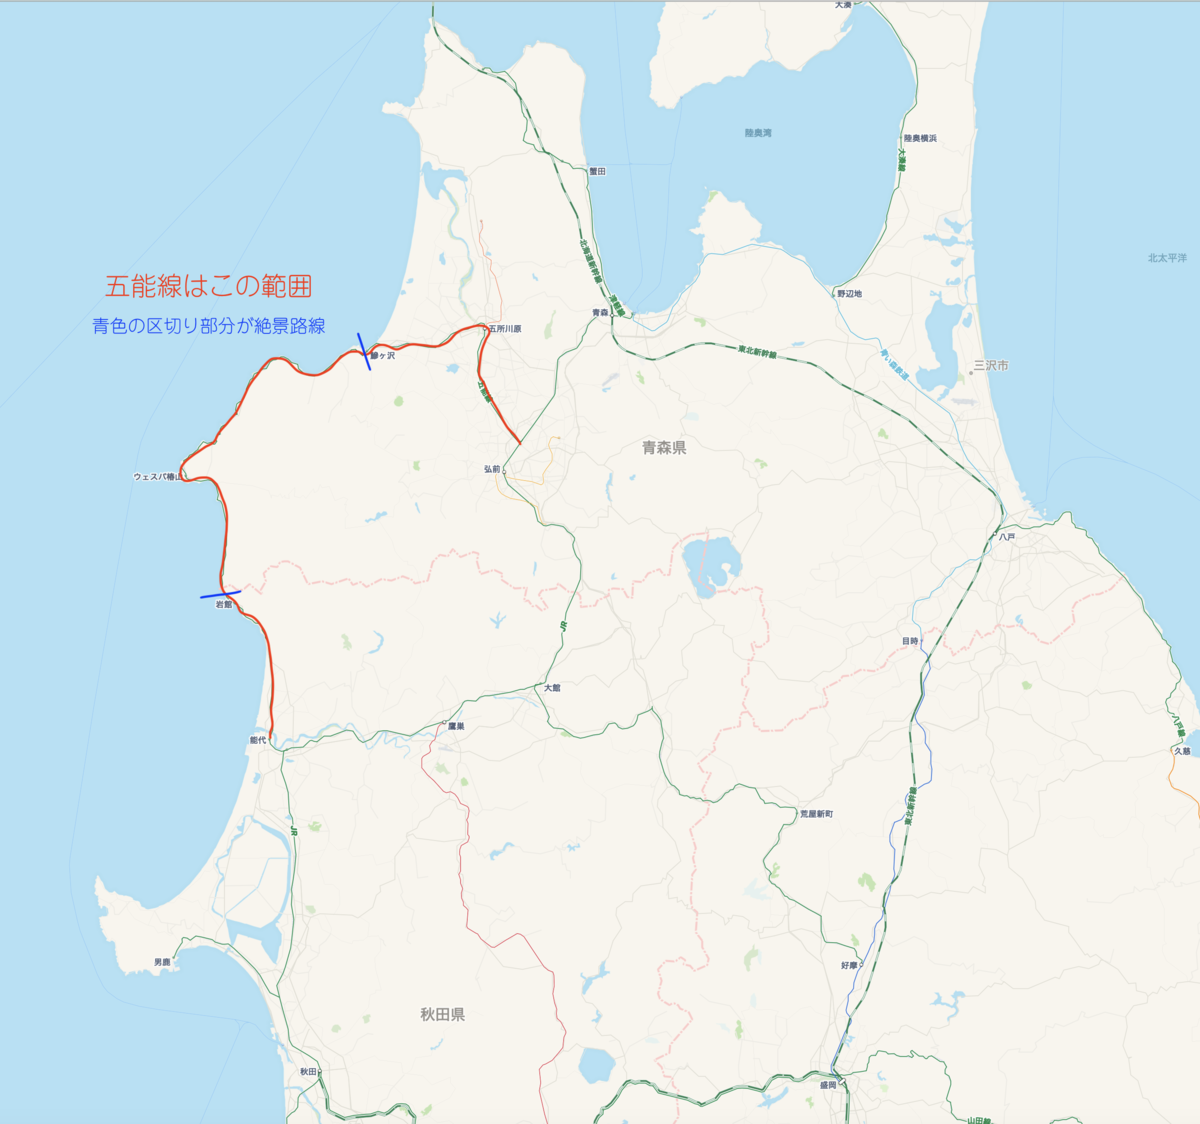 f:id:kootabi:20200204110241p:plain